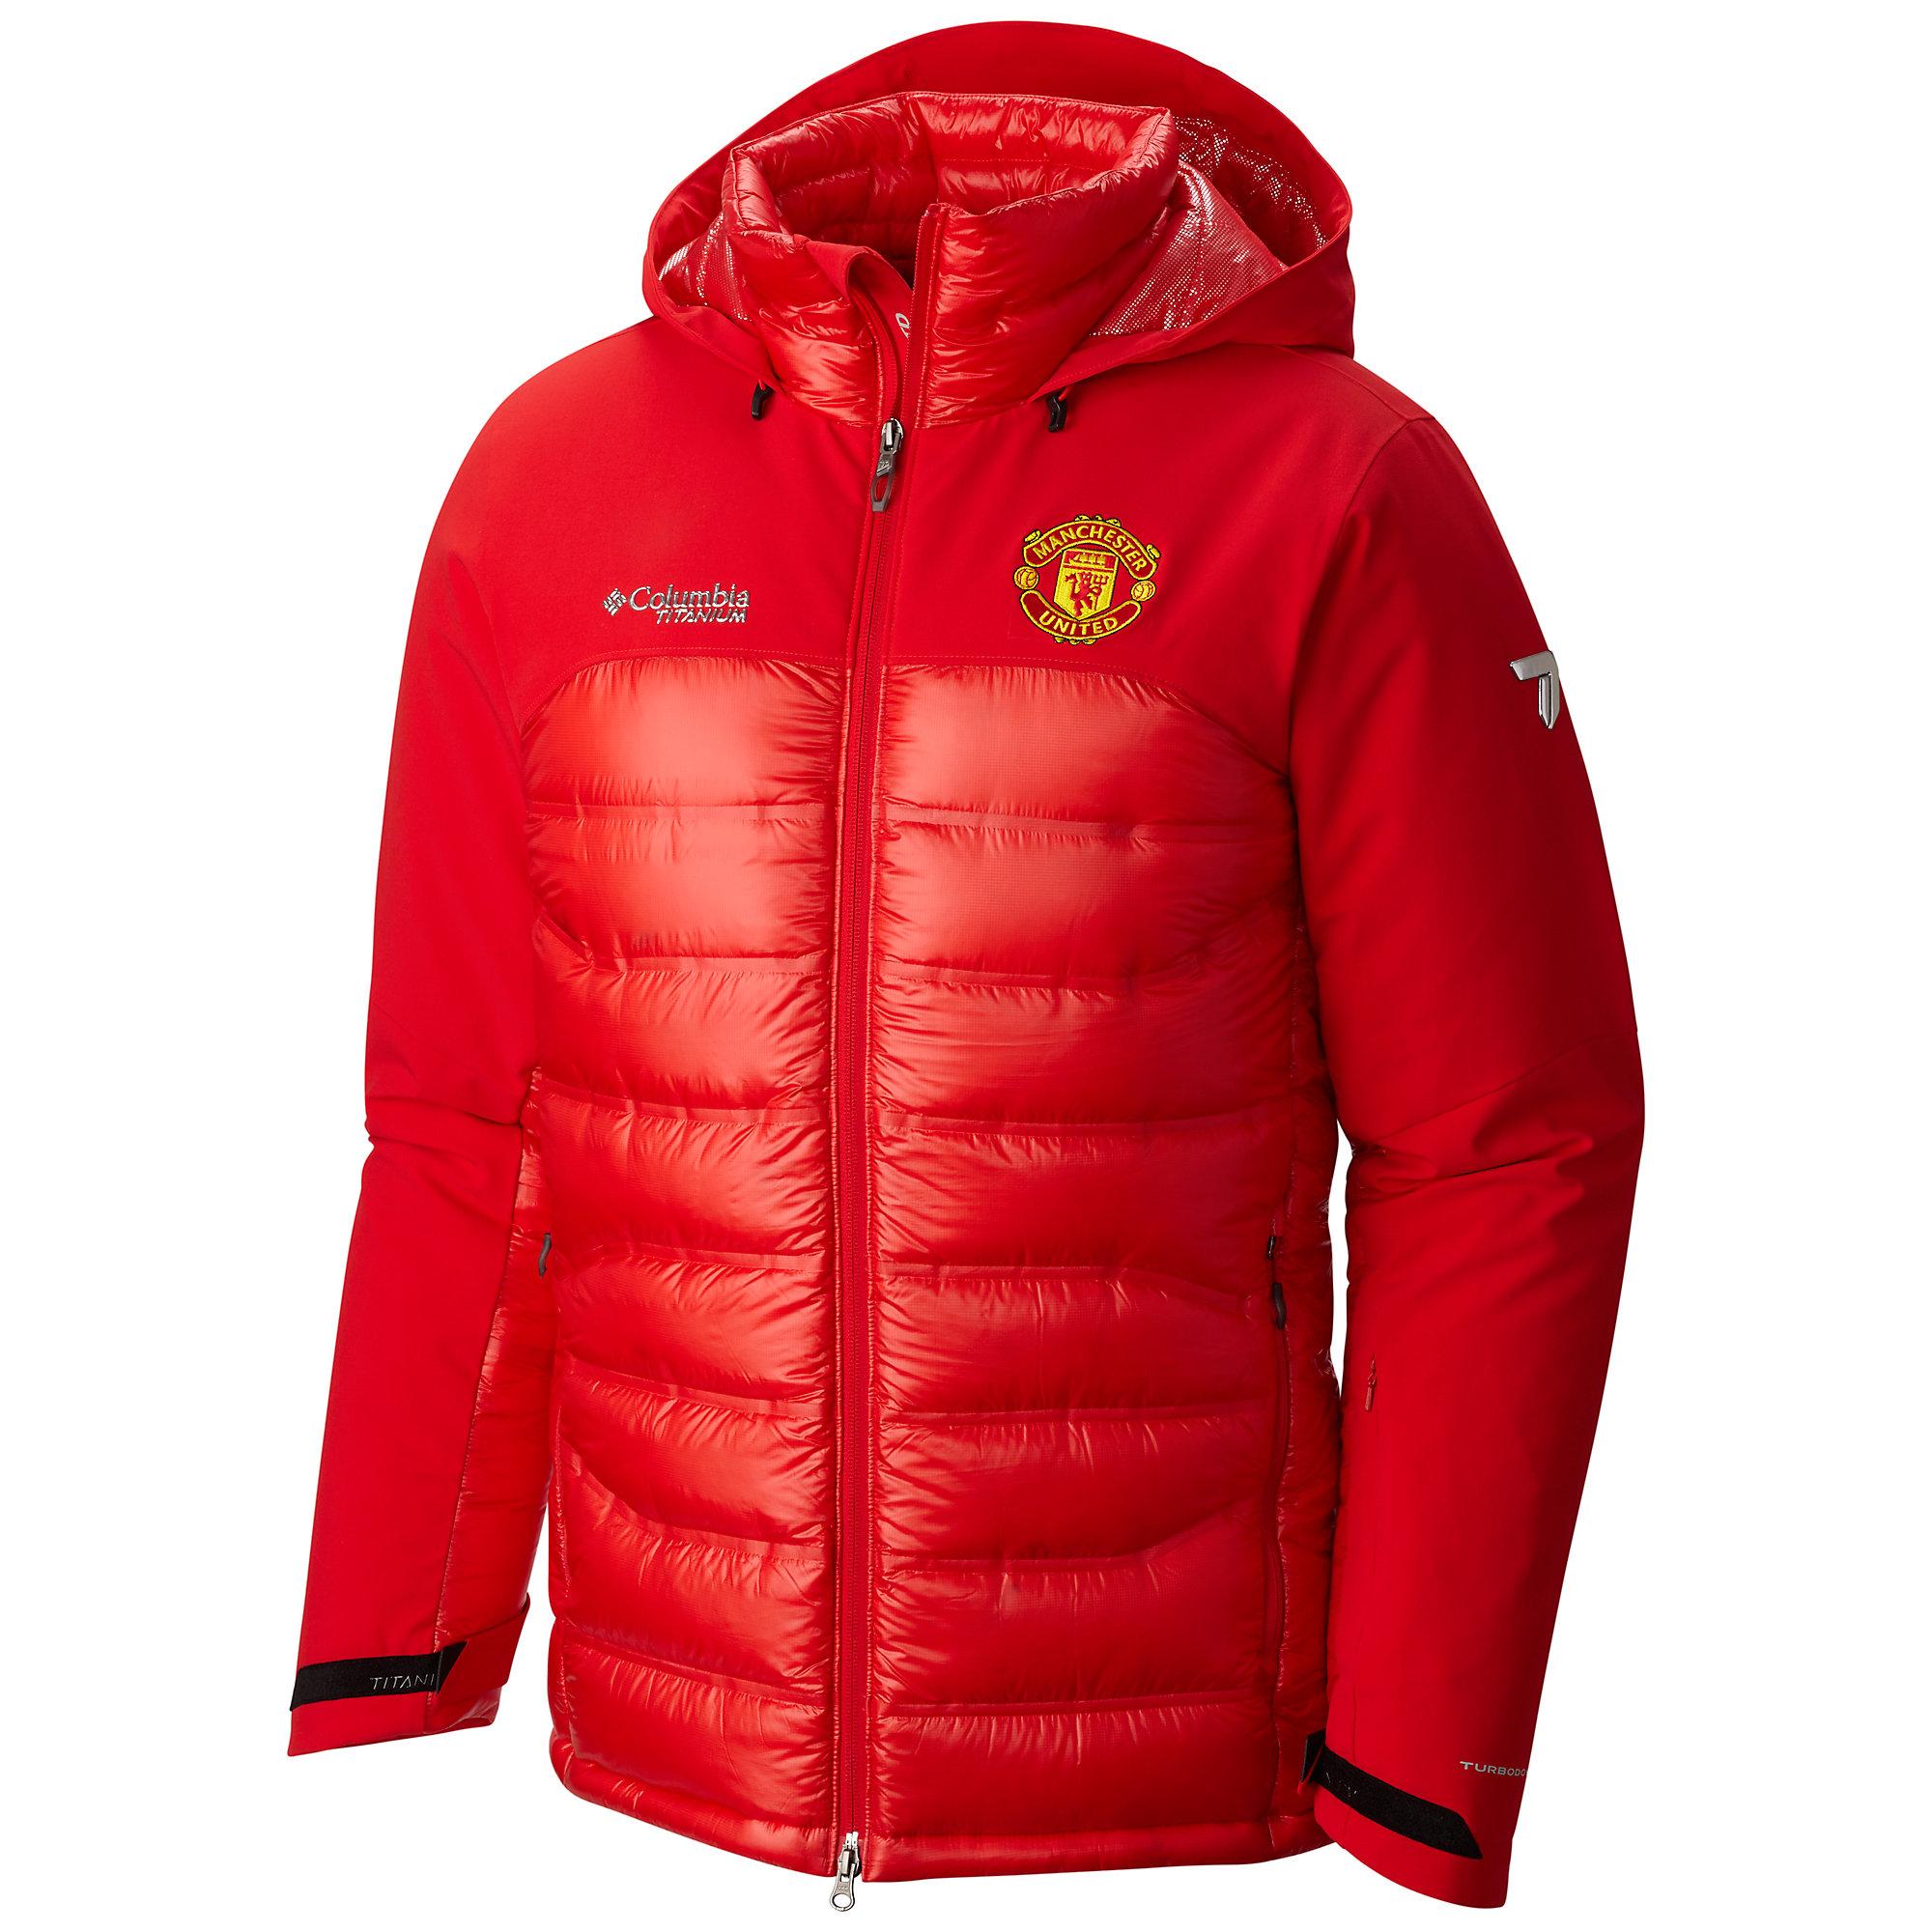 Veste à capuche Heatzone 1000 TurboDown™ Homme -Manchester United